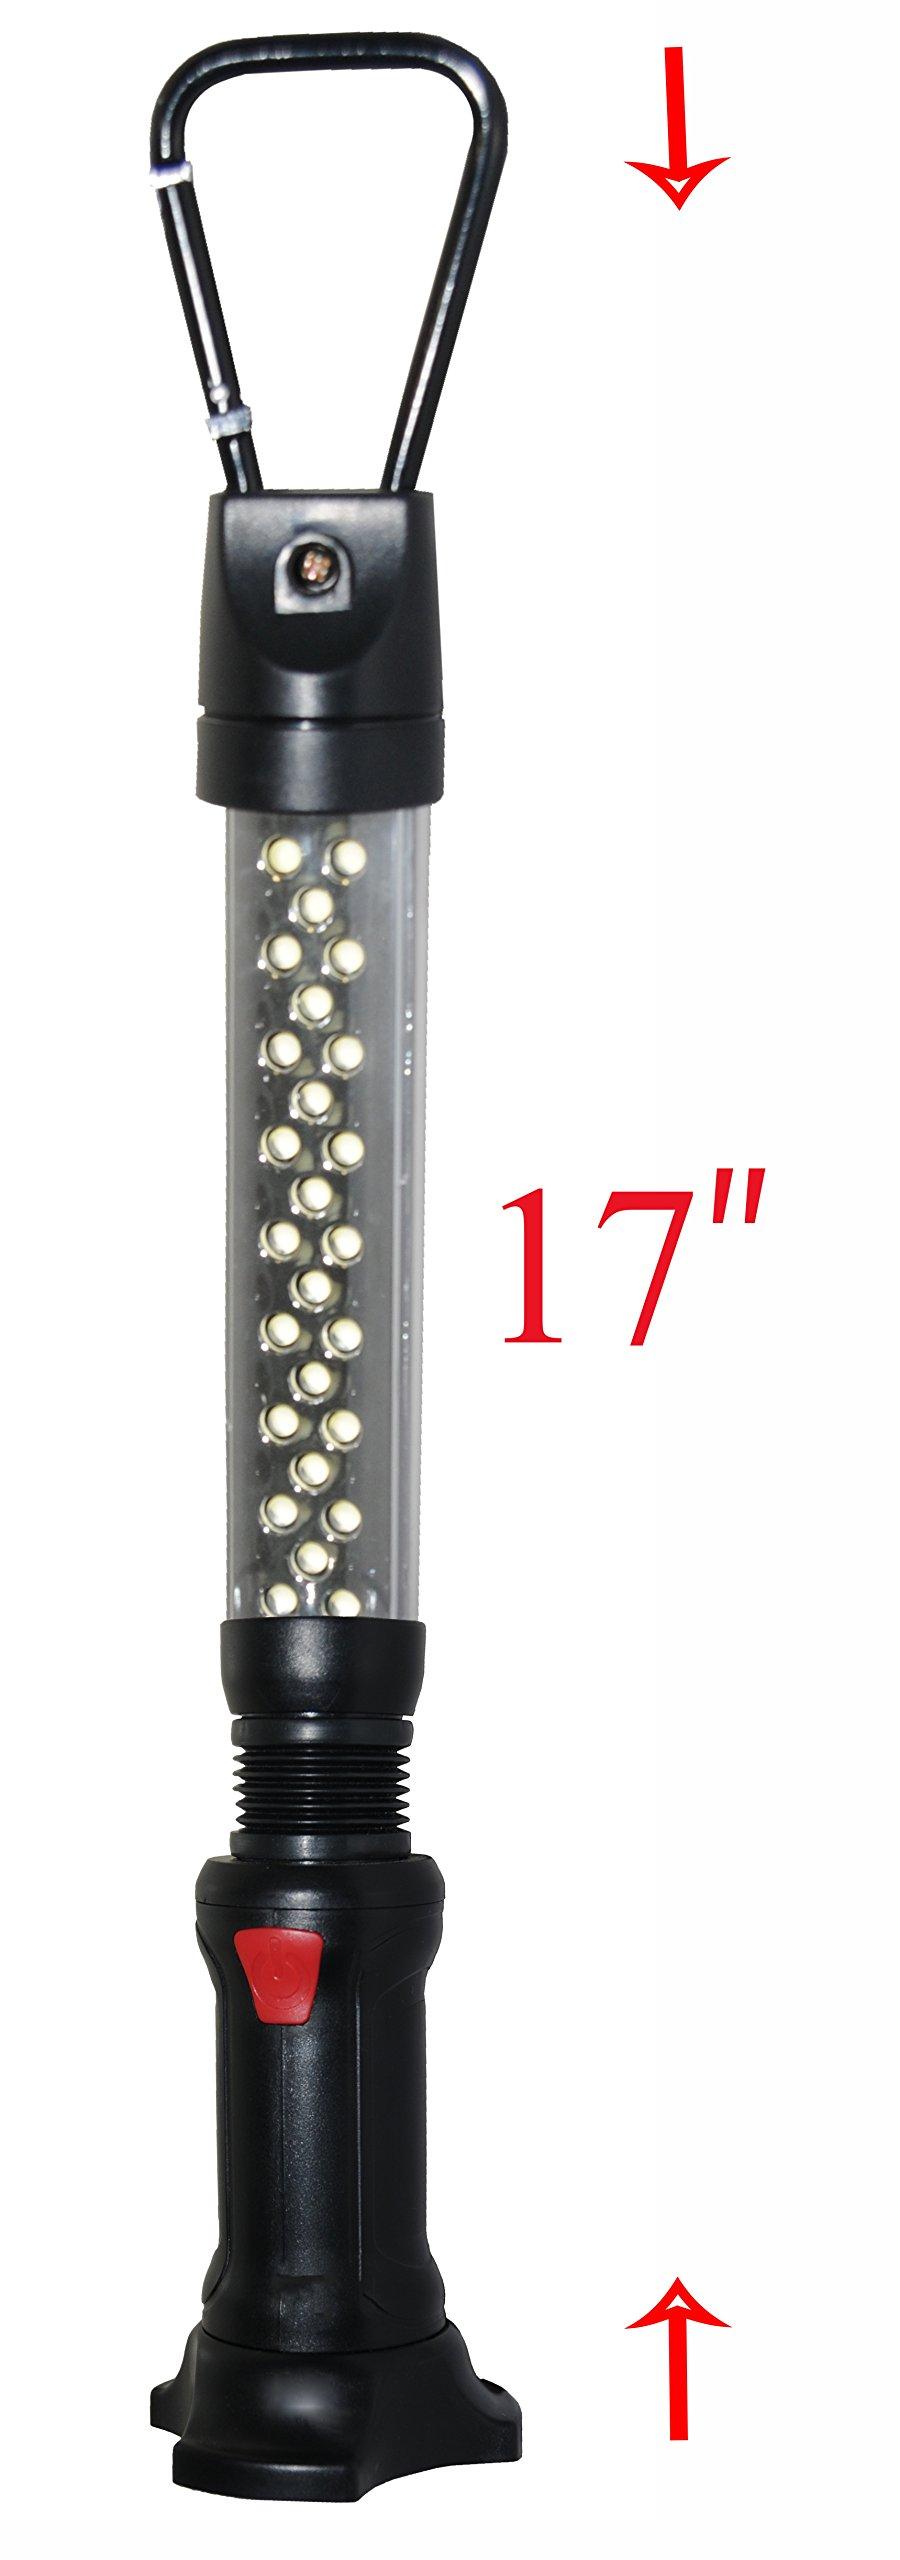 SleekLighting Work Light Terrific Toughness & Durability- Breathtaking Brightness - Powerful Magnetic Base- Swiveling Carabiner Hook